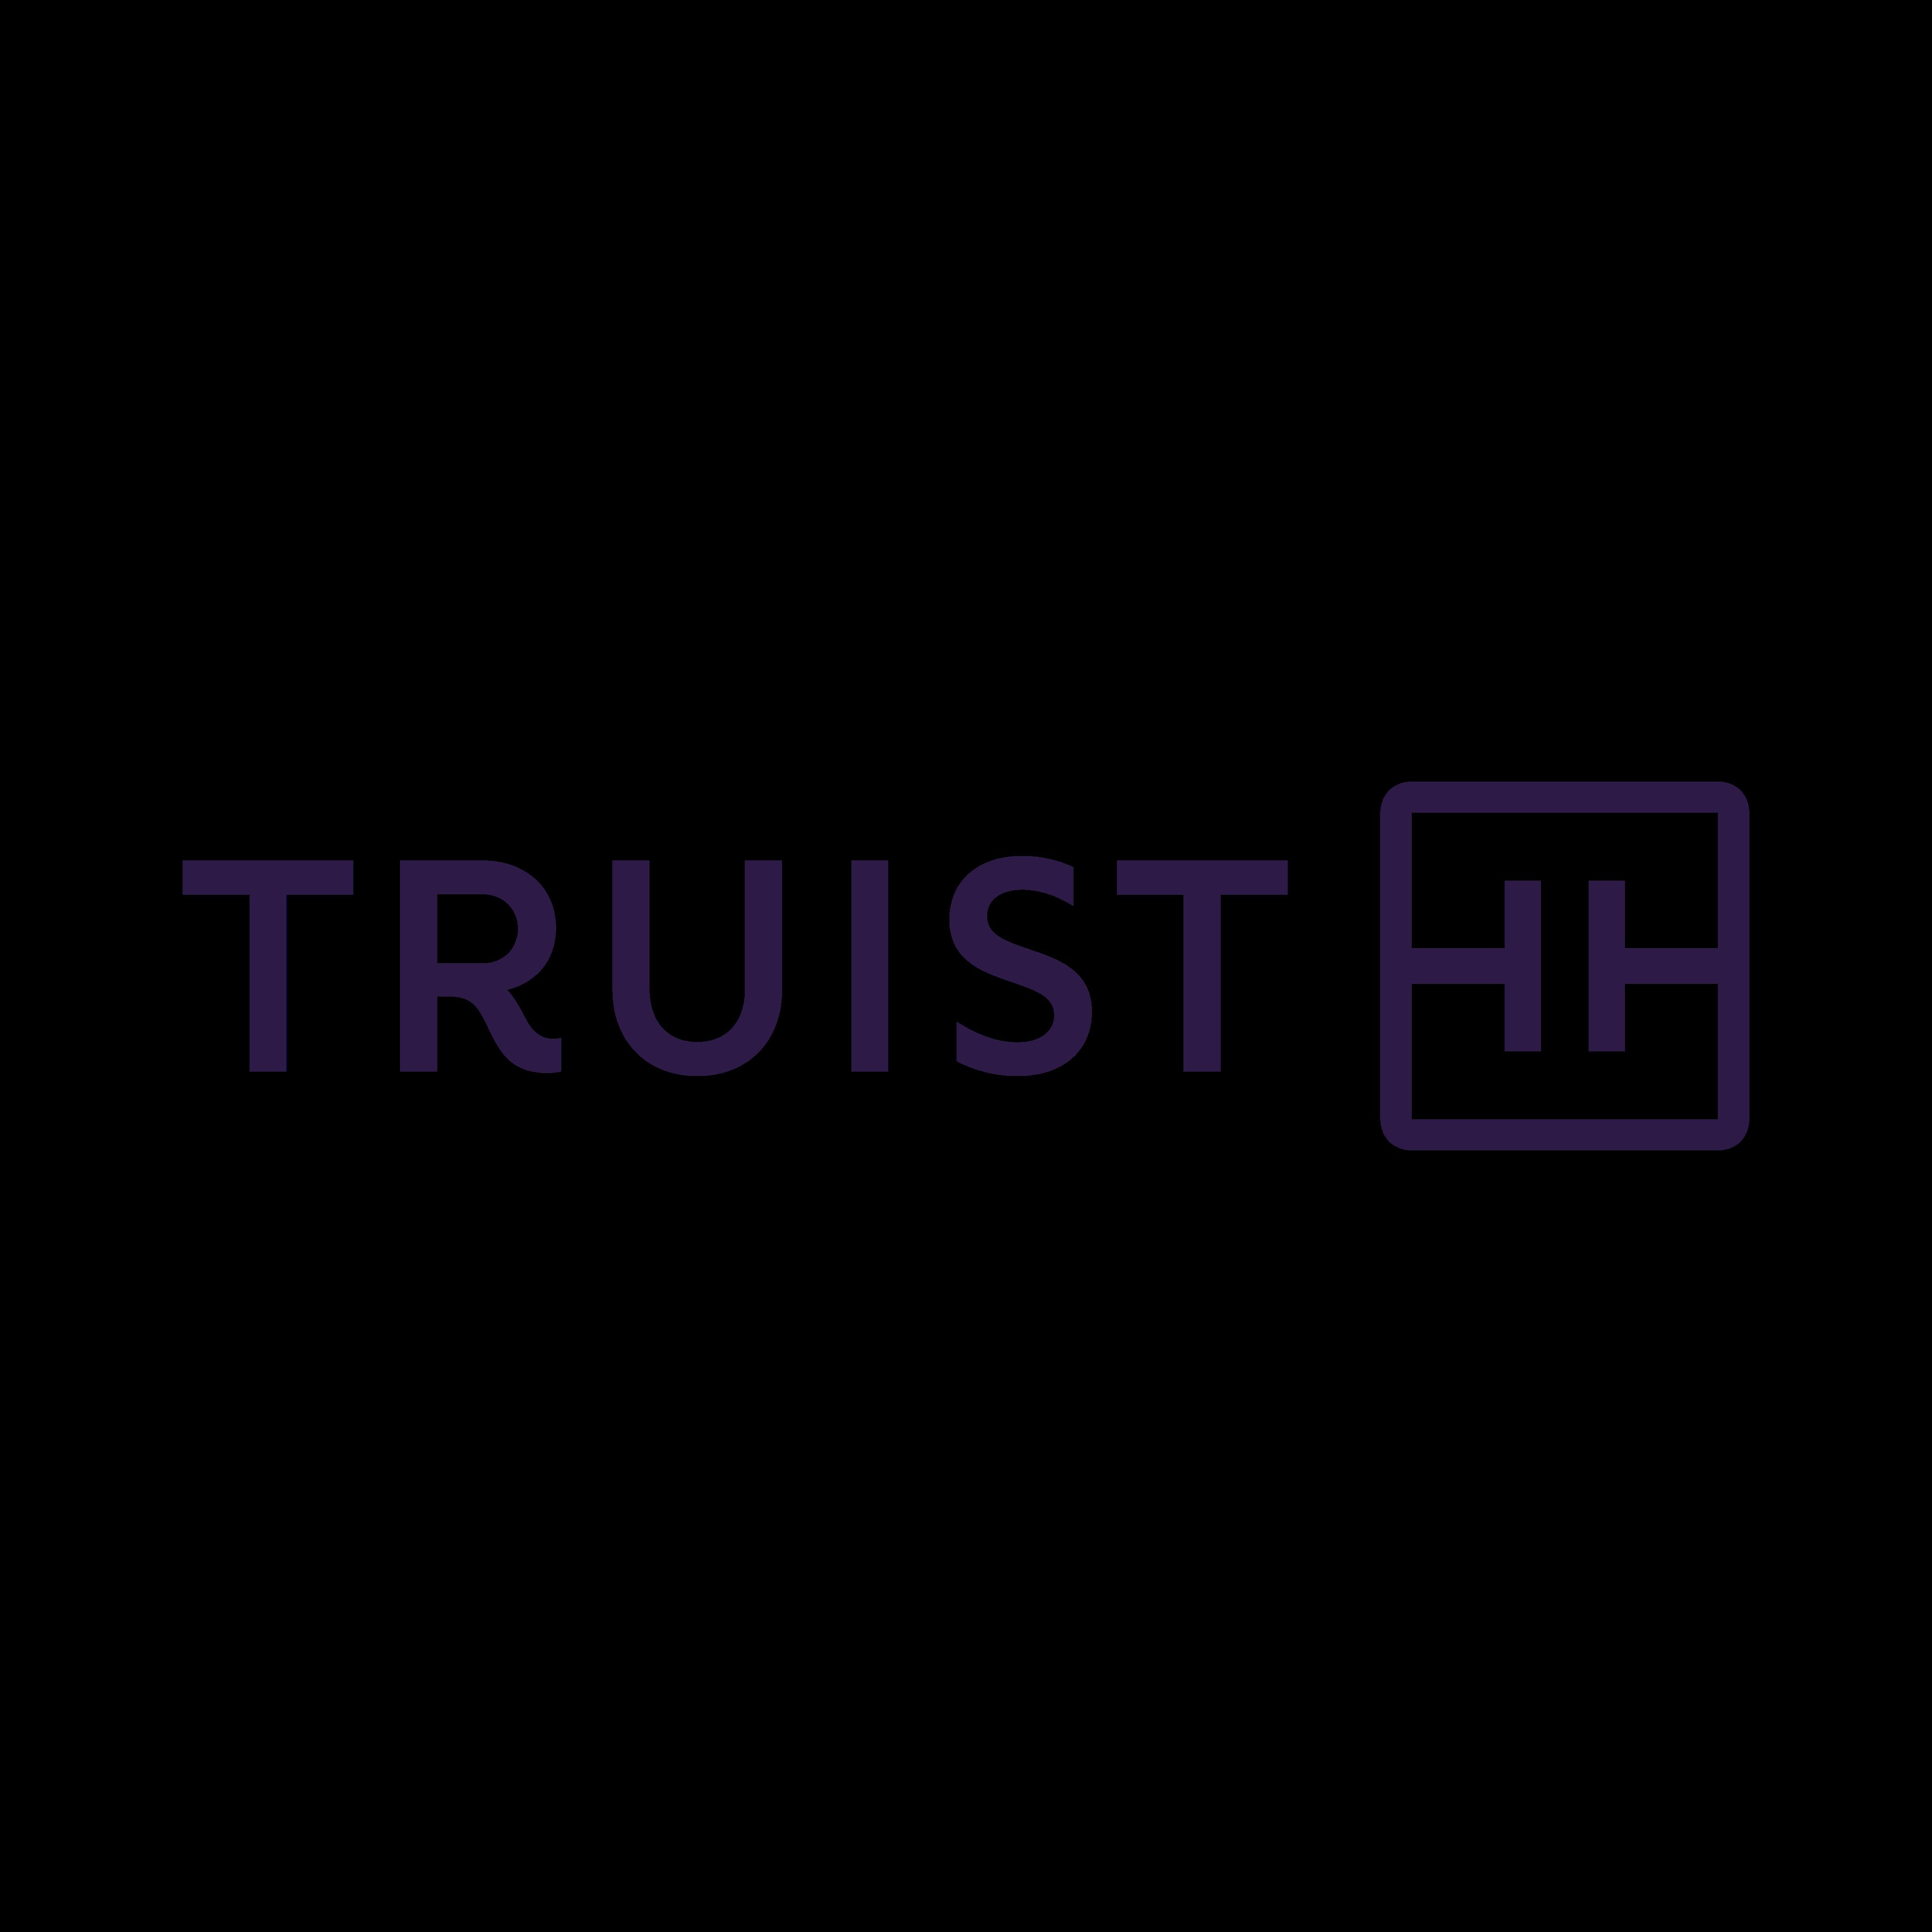 truist logo 0 - Truist Bank Logo